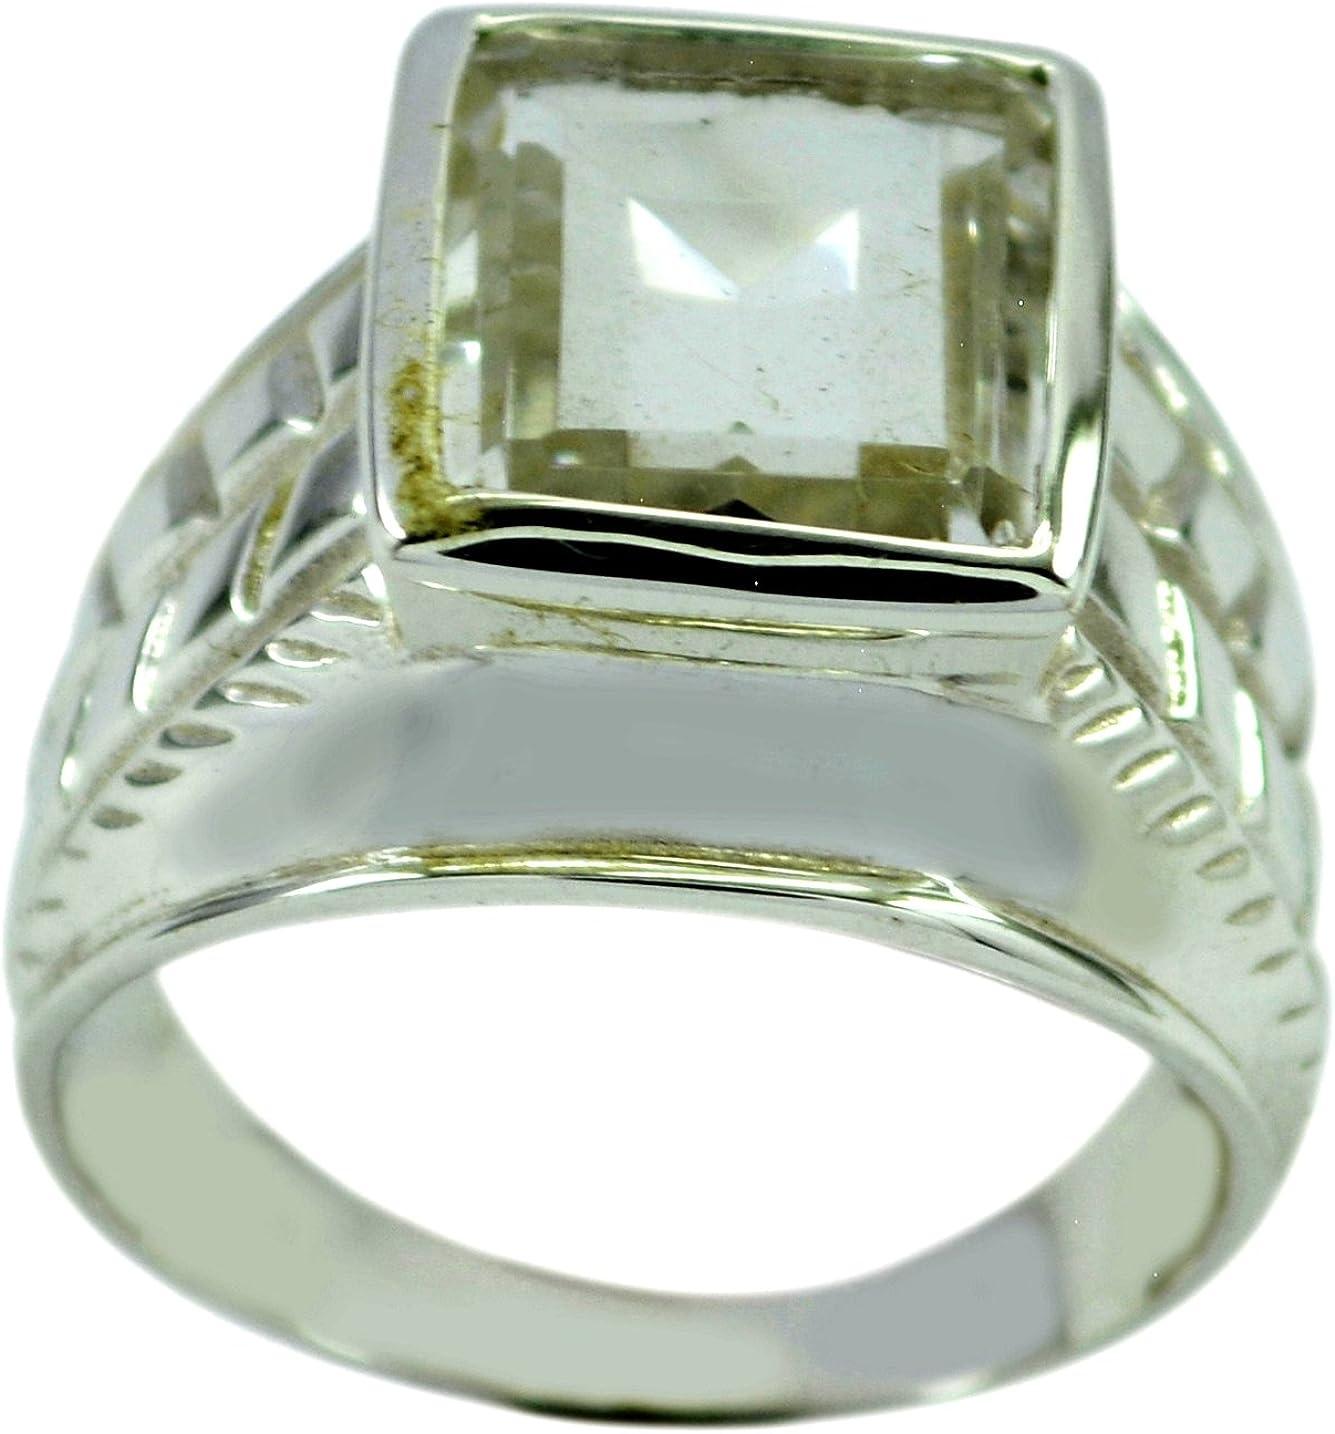 Jewelryonclick Natural Rose Quartz Gold Plated Ring Women Chakra Healing Jewelry Size 5,6,7,8,9,10,11,12